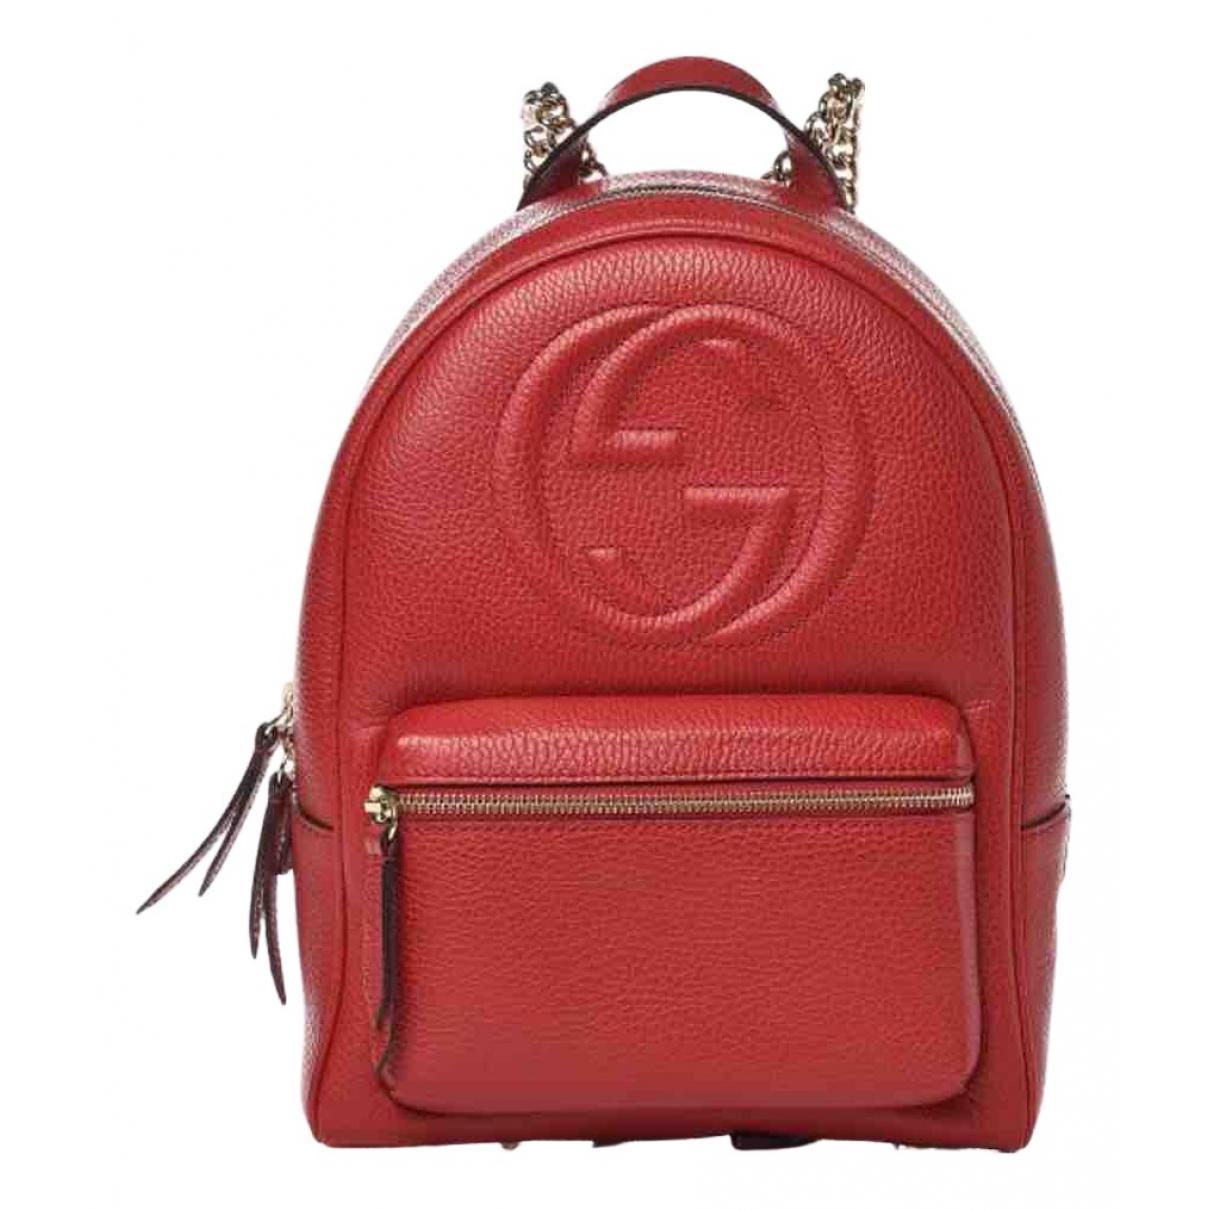 Gucci Soho Rucksaecke in  Rot Leder